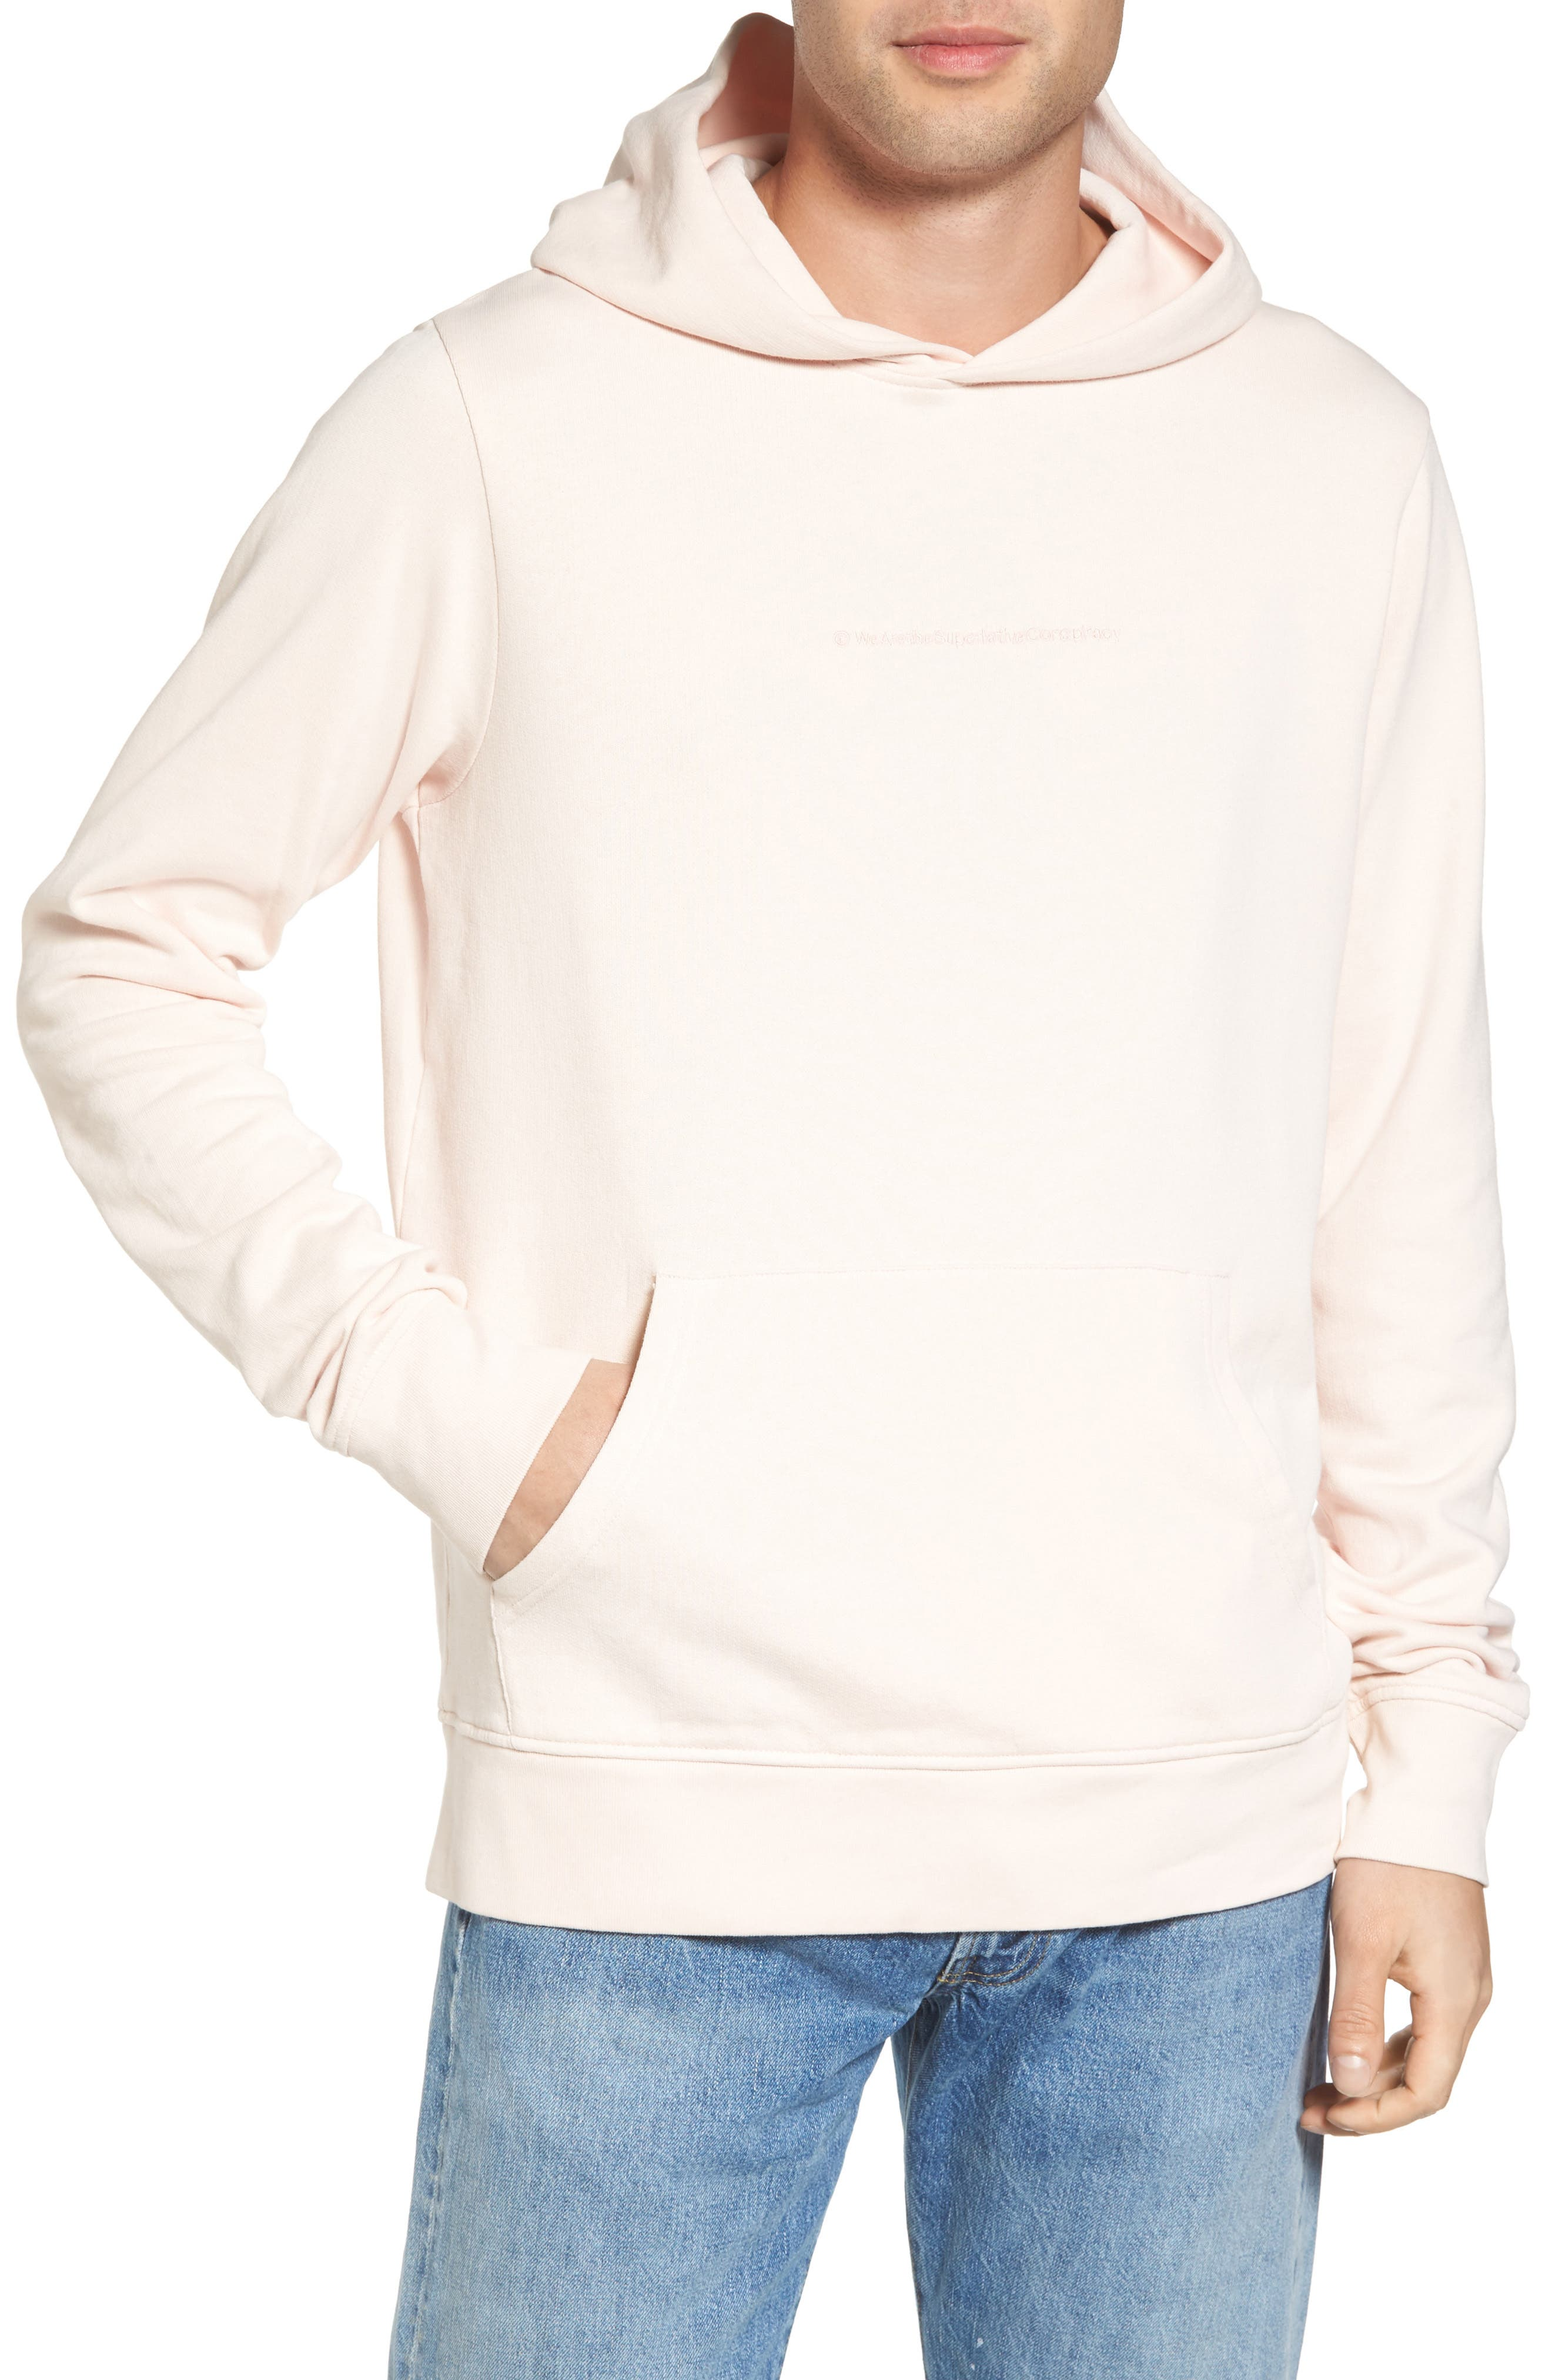 Mike Fleece Hoodie,                         Main,                         color, Pink Blush